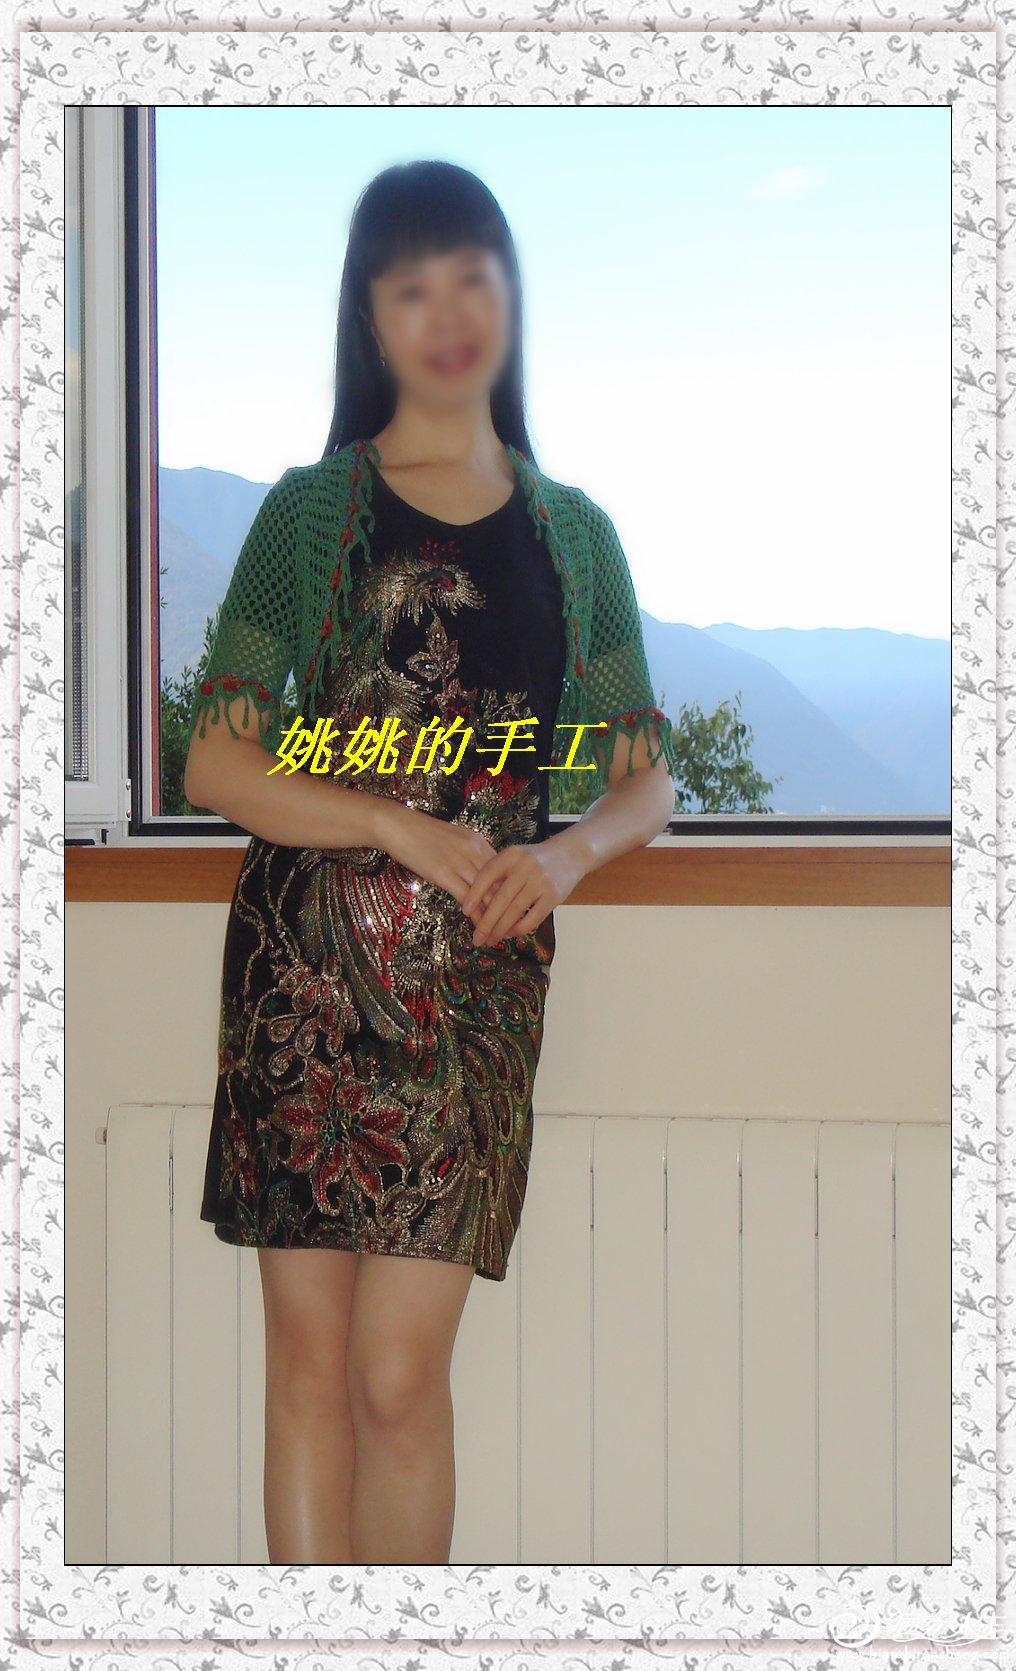 DSC00649-1.jpg